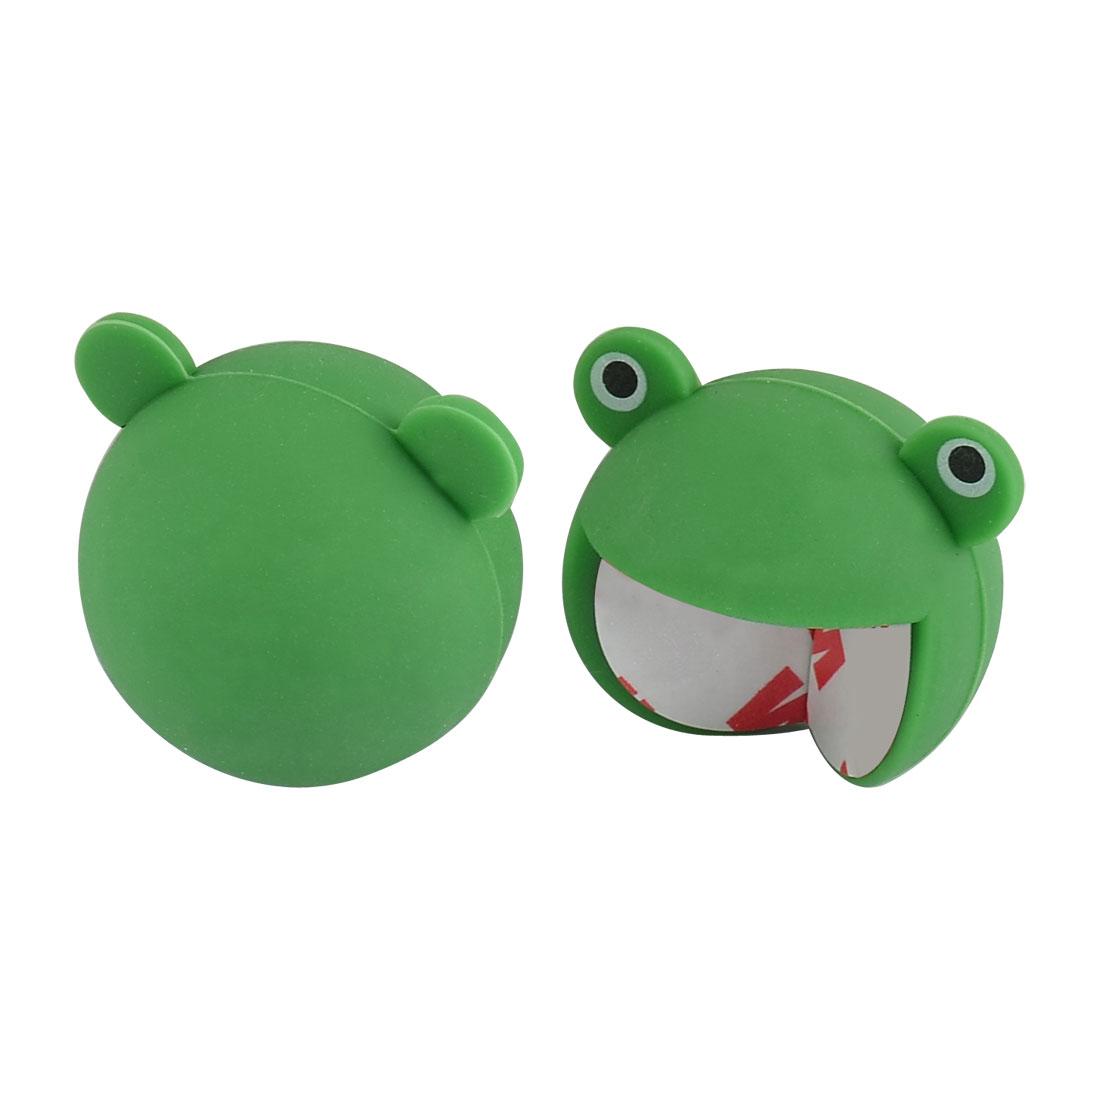 Cartoon Frog Design Corner Cushions Safety Table Desk Edge Protector 2 Pcs